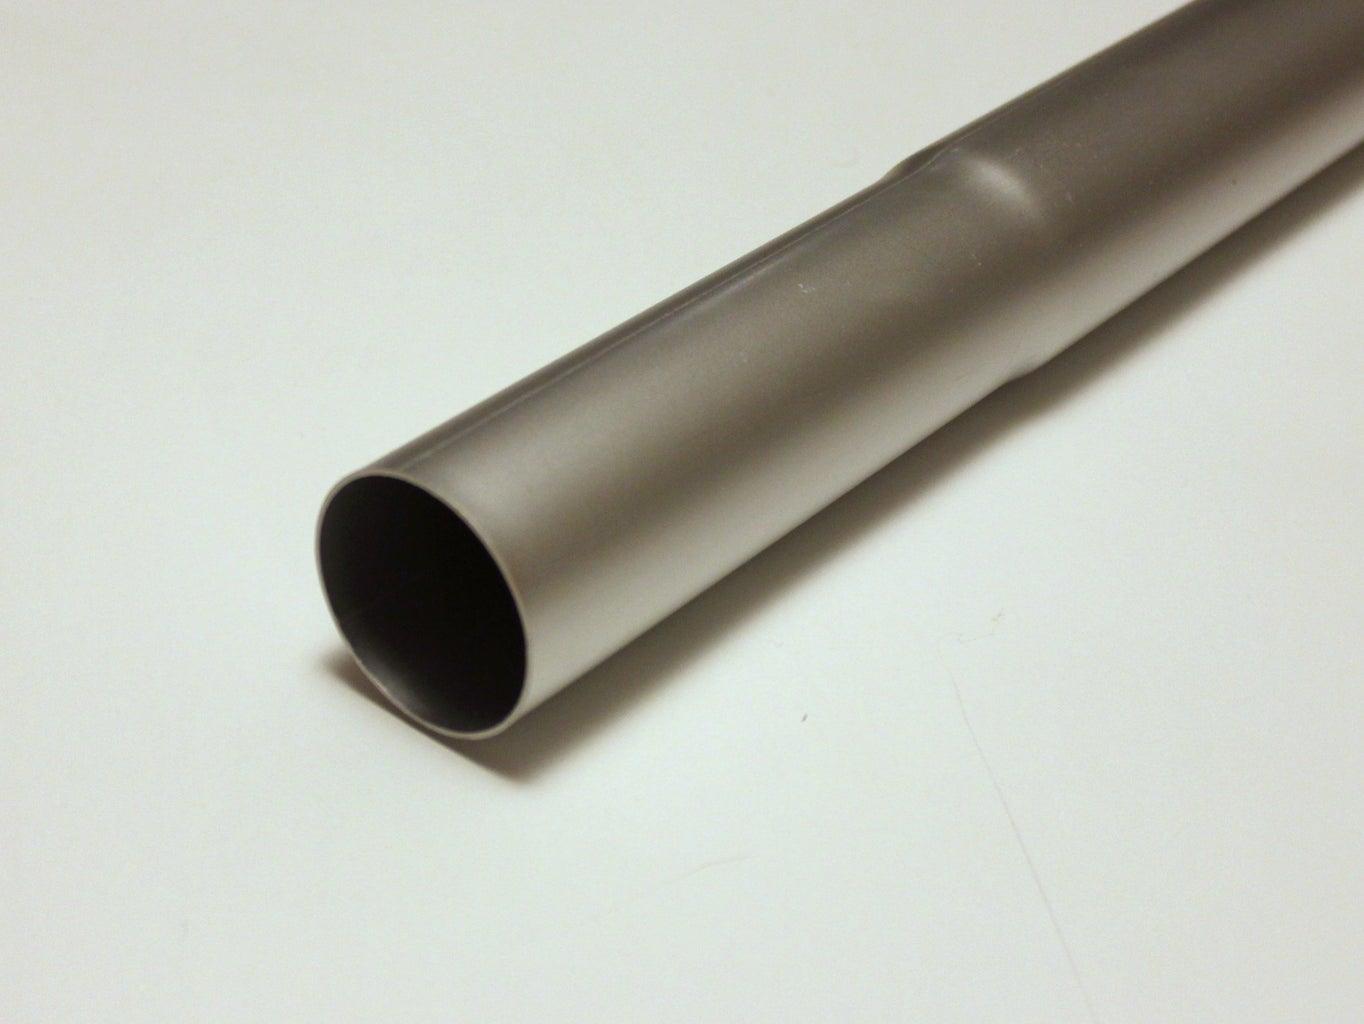 Selecting the Aluminum Pole